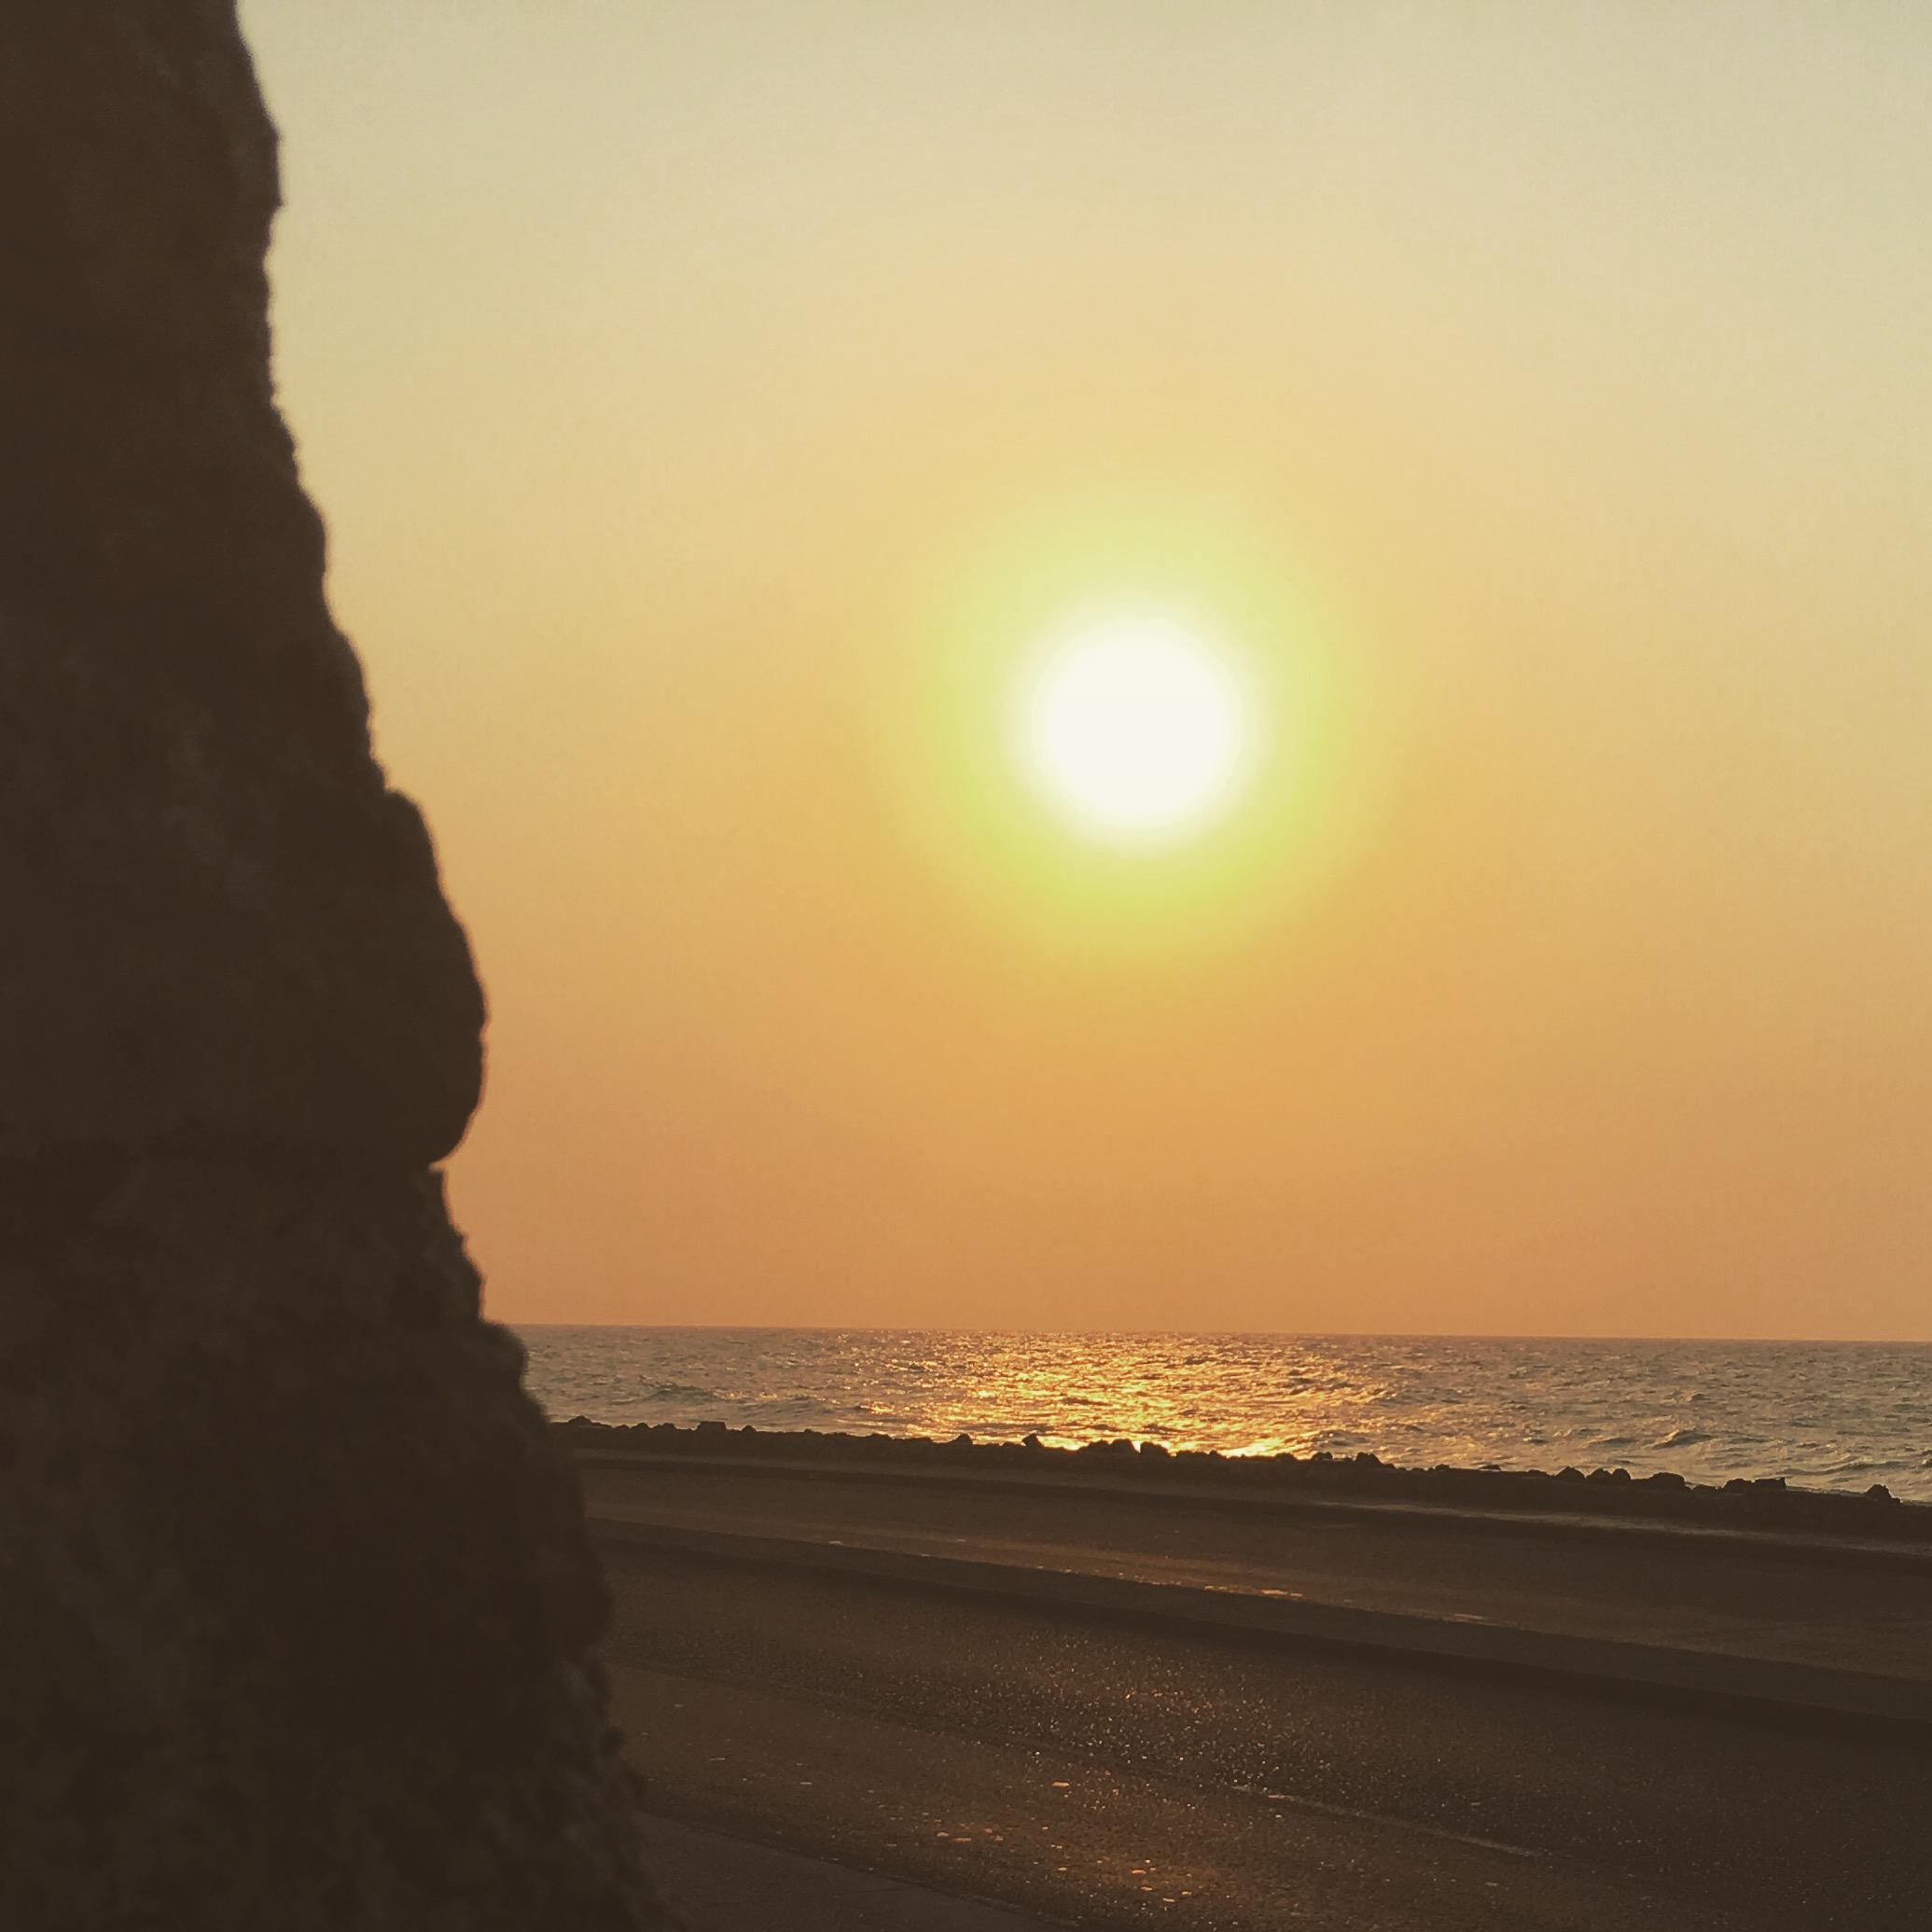 Sunset watching, my favorite activity.